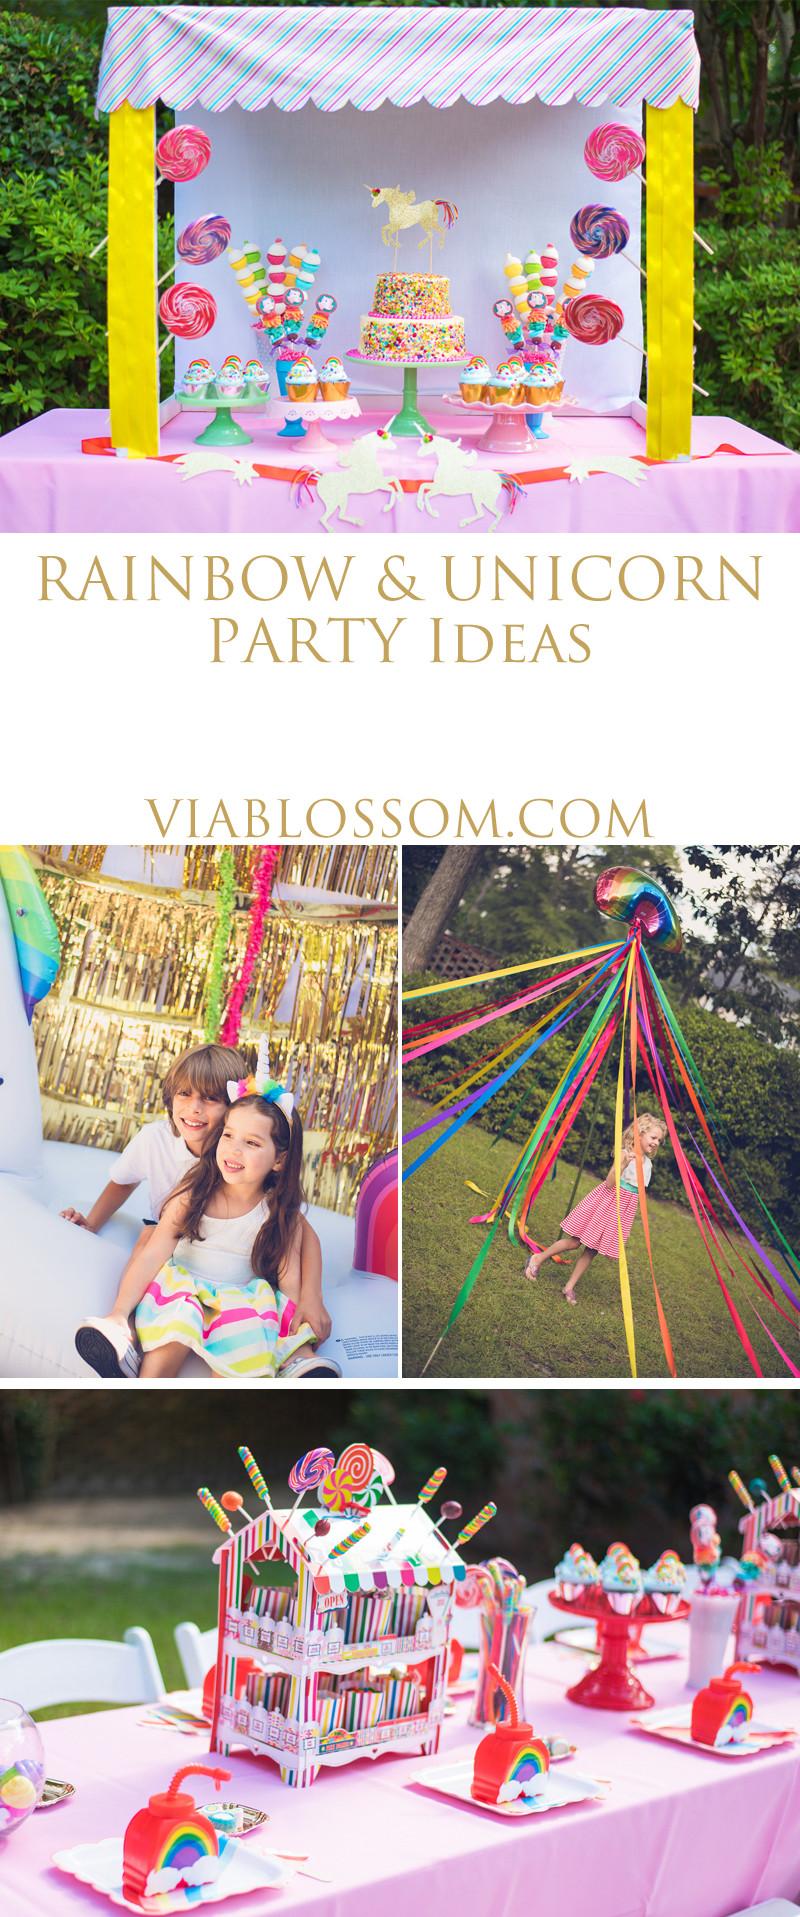 Rainbow Unicorn Birthday Party Ideas  Rainbow and Unicorn Birthday Party Via Blossom